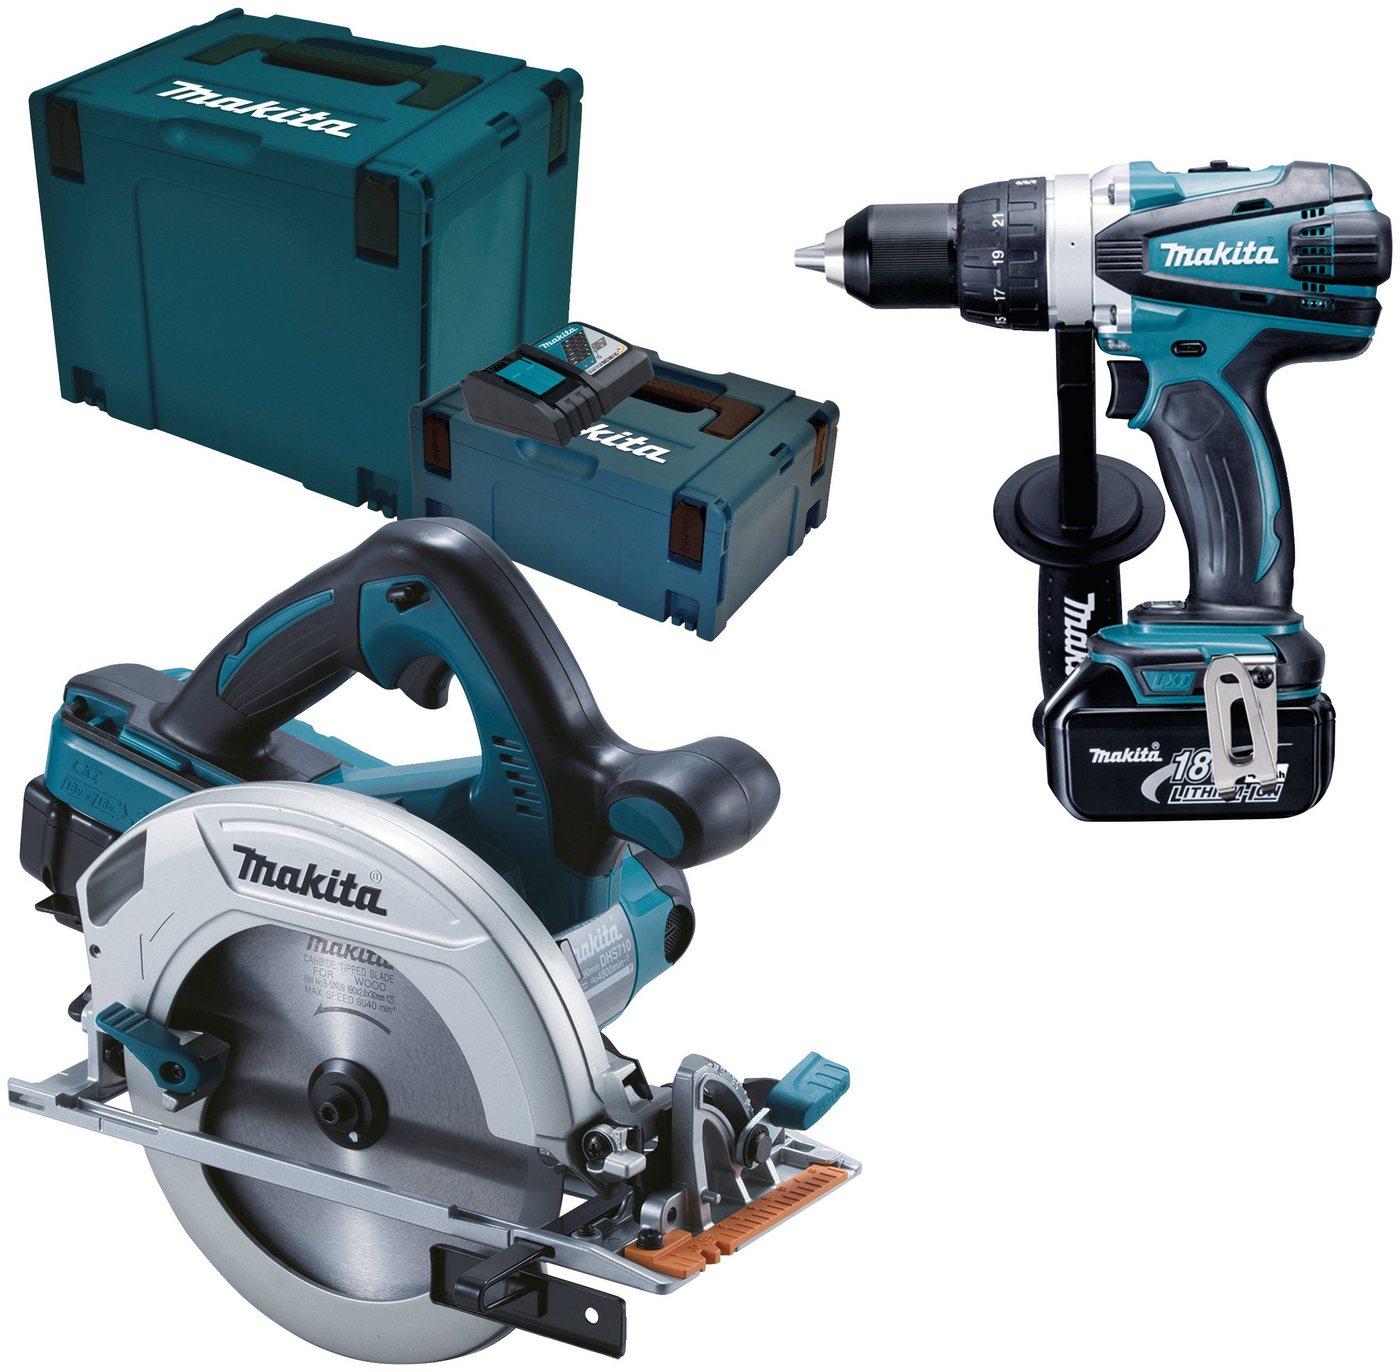 MAKITA Elektrowerkzeug-Set »DLX2083MJ«, 18 V, mit Akkus und Ladegerät | Baumarkt > Werkzeug > Werkzeug-Sets | Blau | Makita